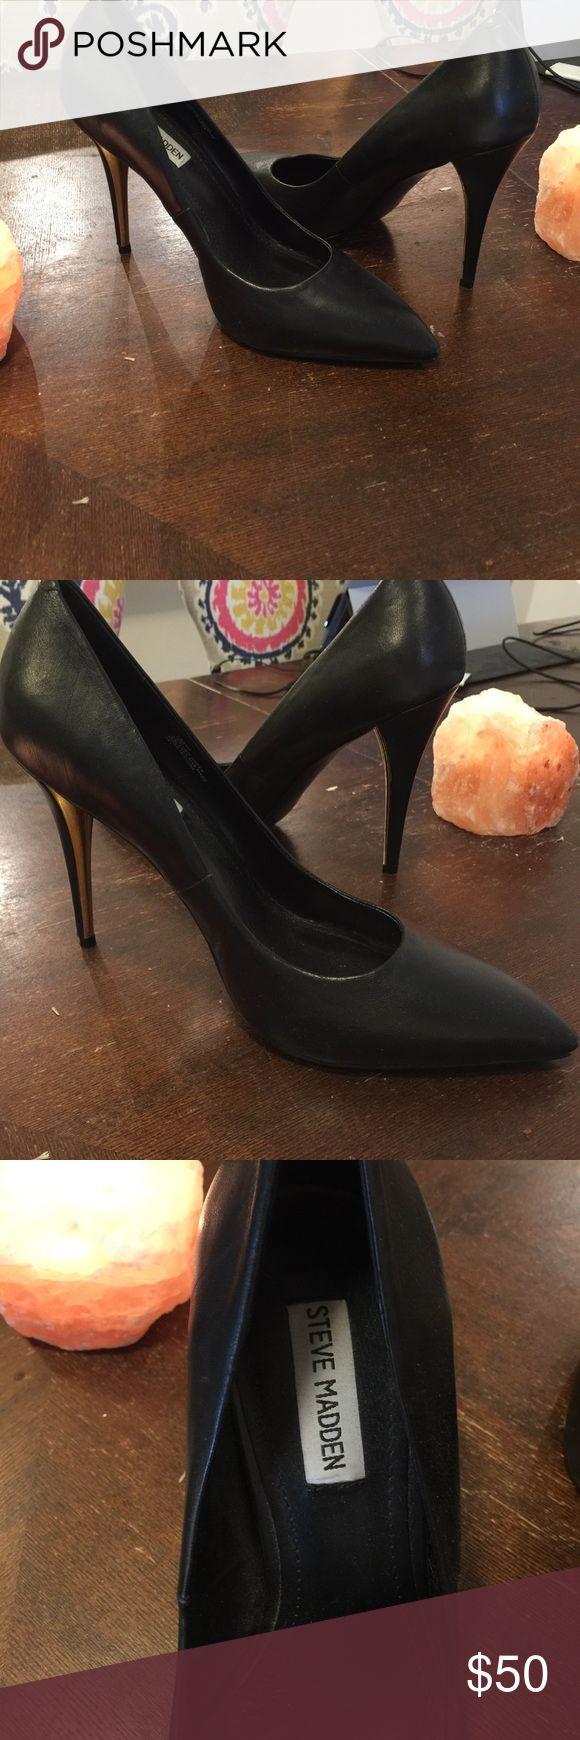 Steve Madden Black Heels with Gold Heel Killer black heels with shiny gold inside heel. Never worn! Fits somewhere between a 9.5-10. Steve Madden Shoes Heels